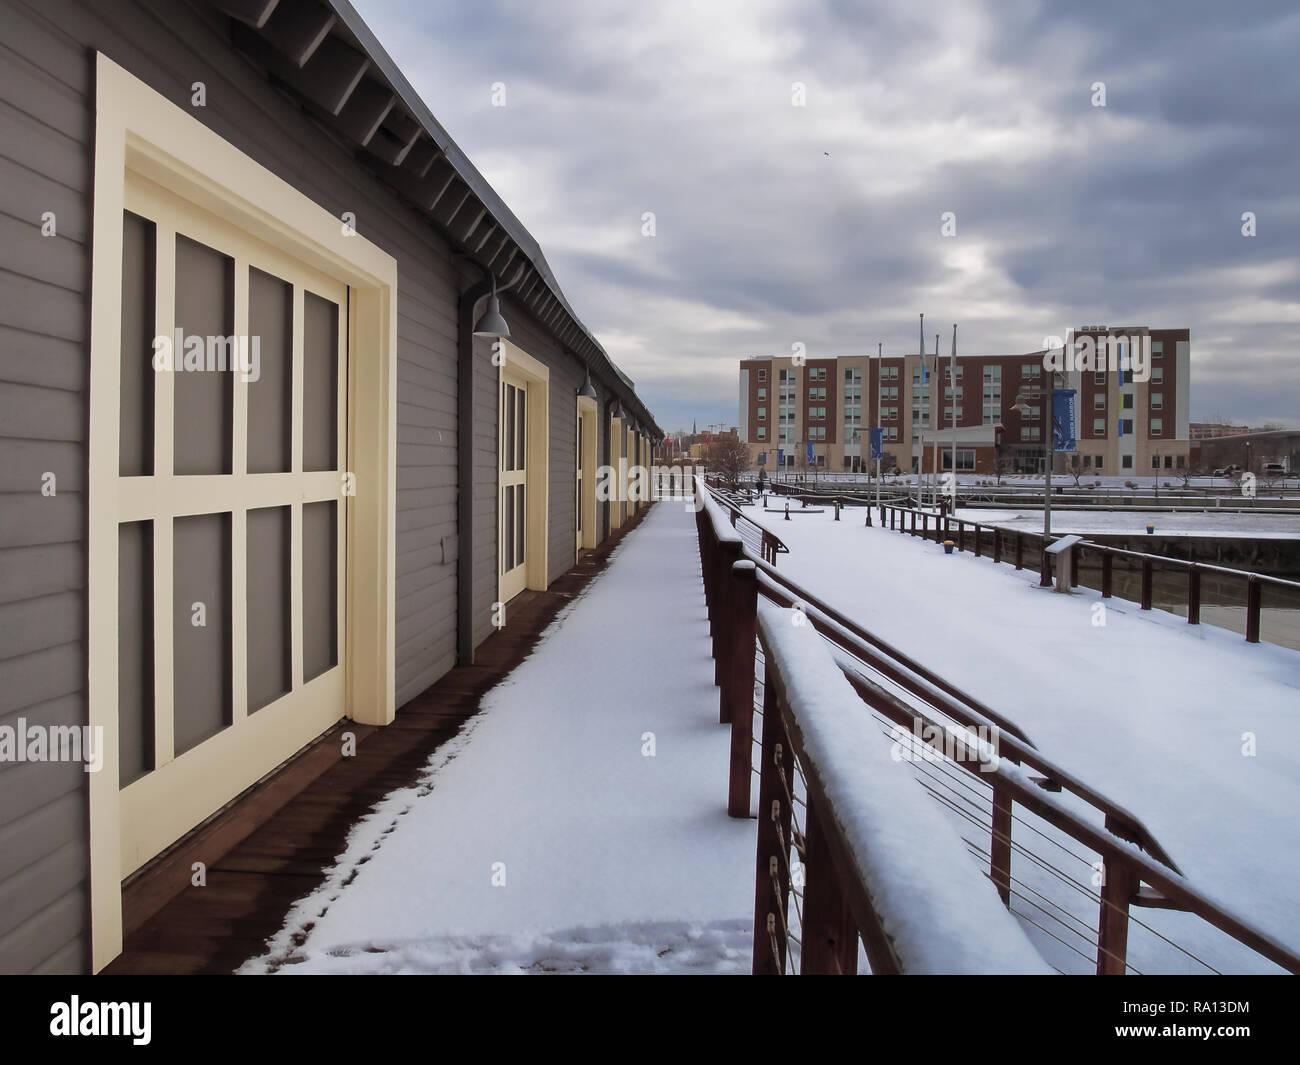 Syracuse, New Yiork, USA. December 25, 2018.  The Inner Harbor in Syracuse , New York, a popular public park and recreation area on Onondaga Lake - Stock Image